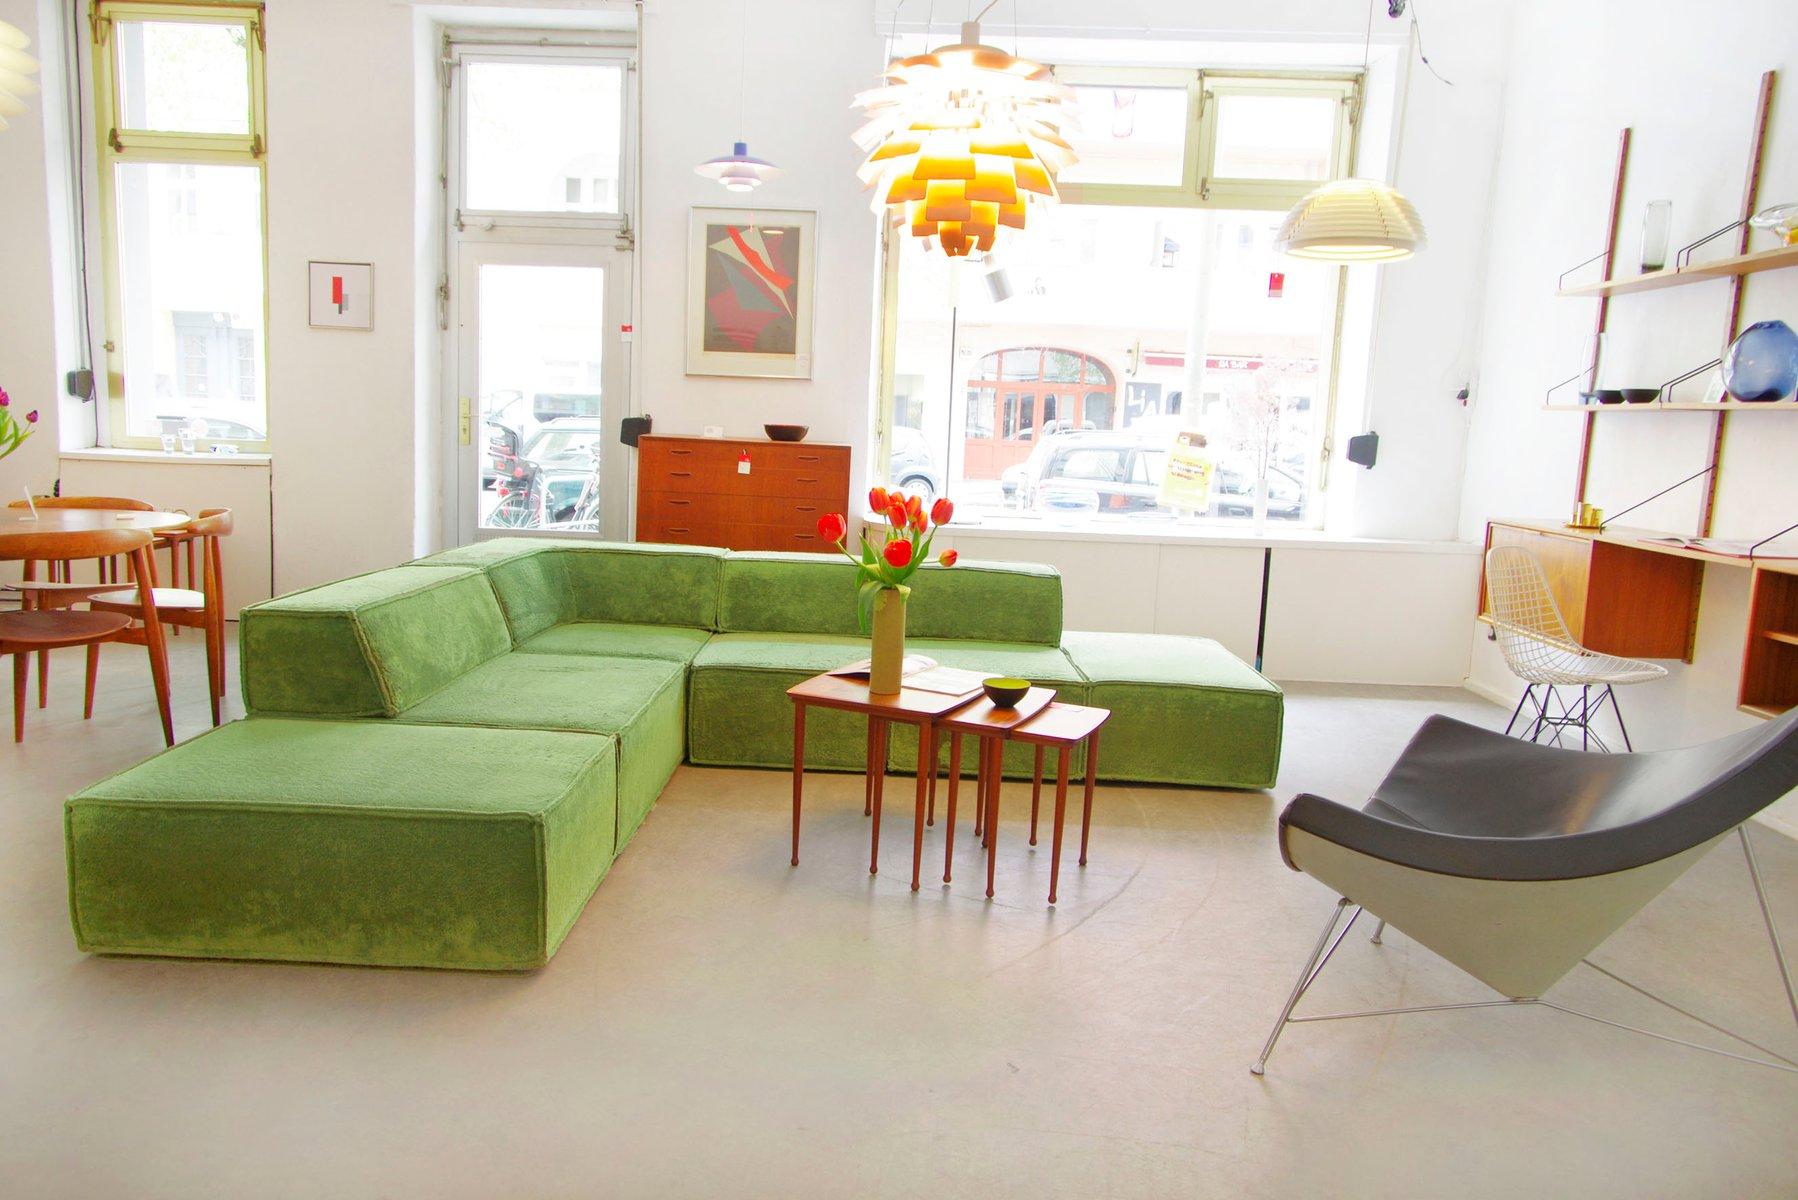 modulares ecksofa von form ag f r cor 1972 bei pamono kaufen. Black Bedroom Furniture Sets. Home Design Ideas